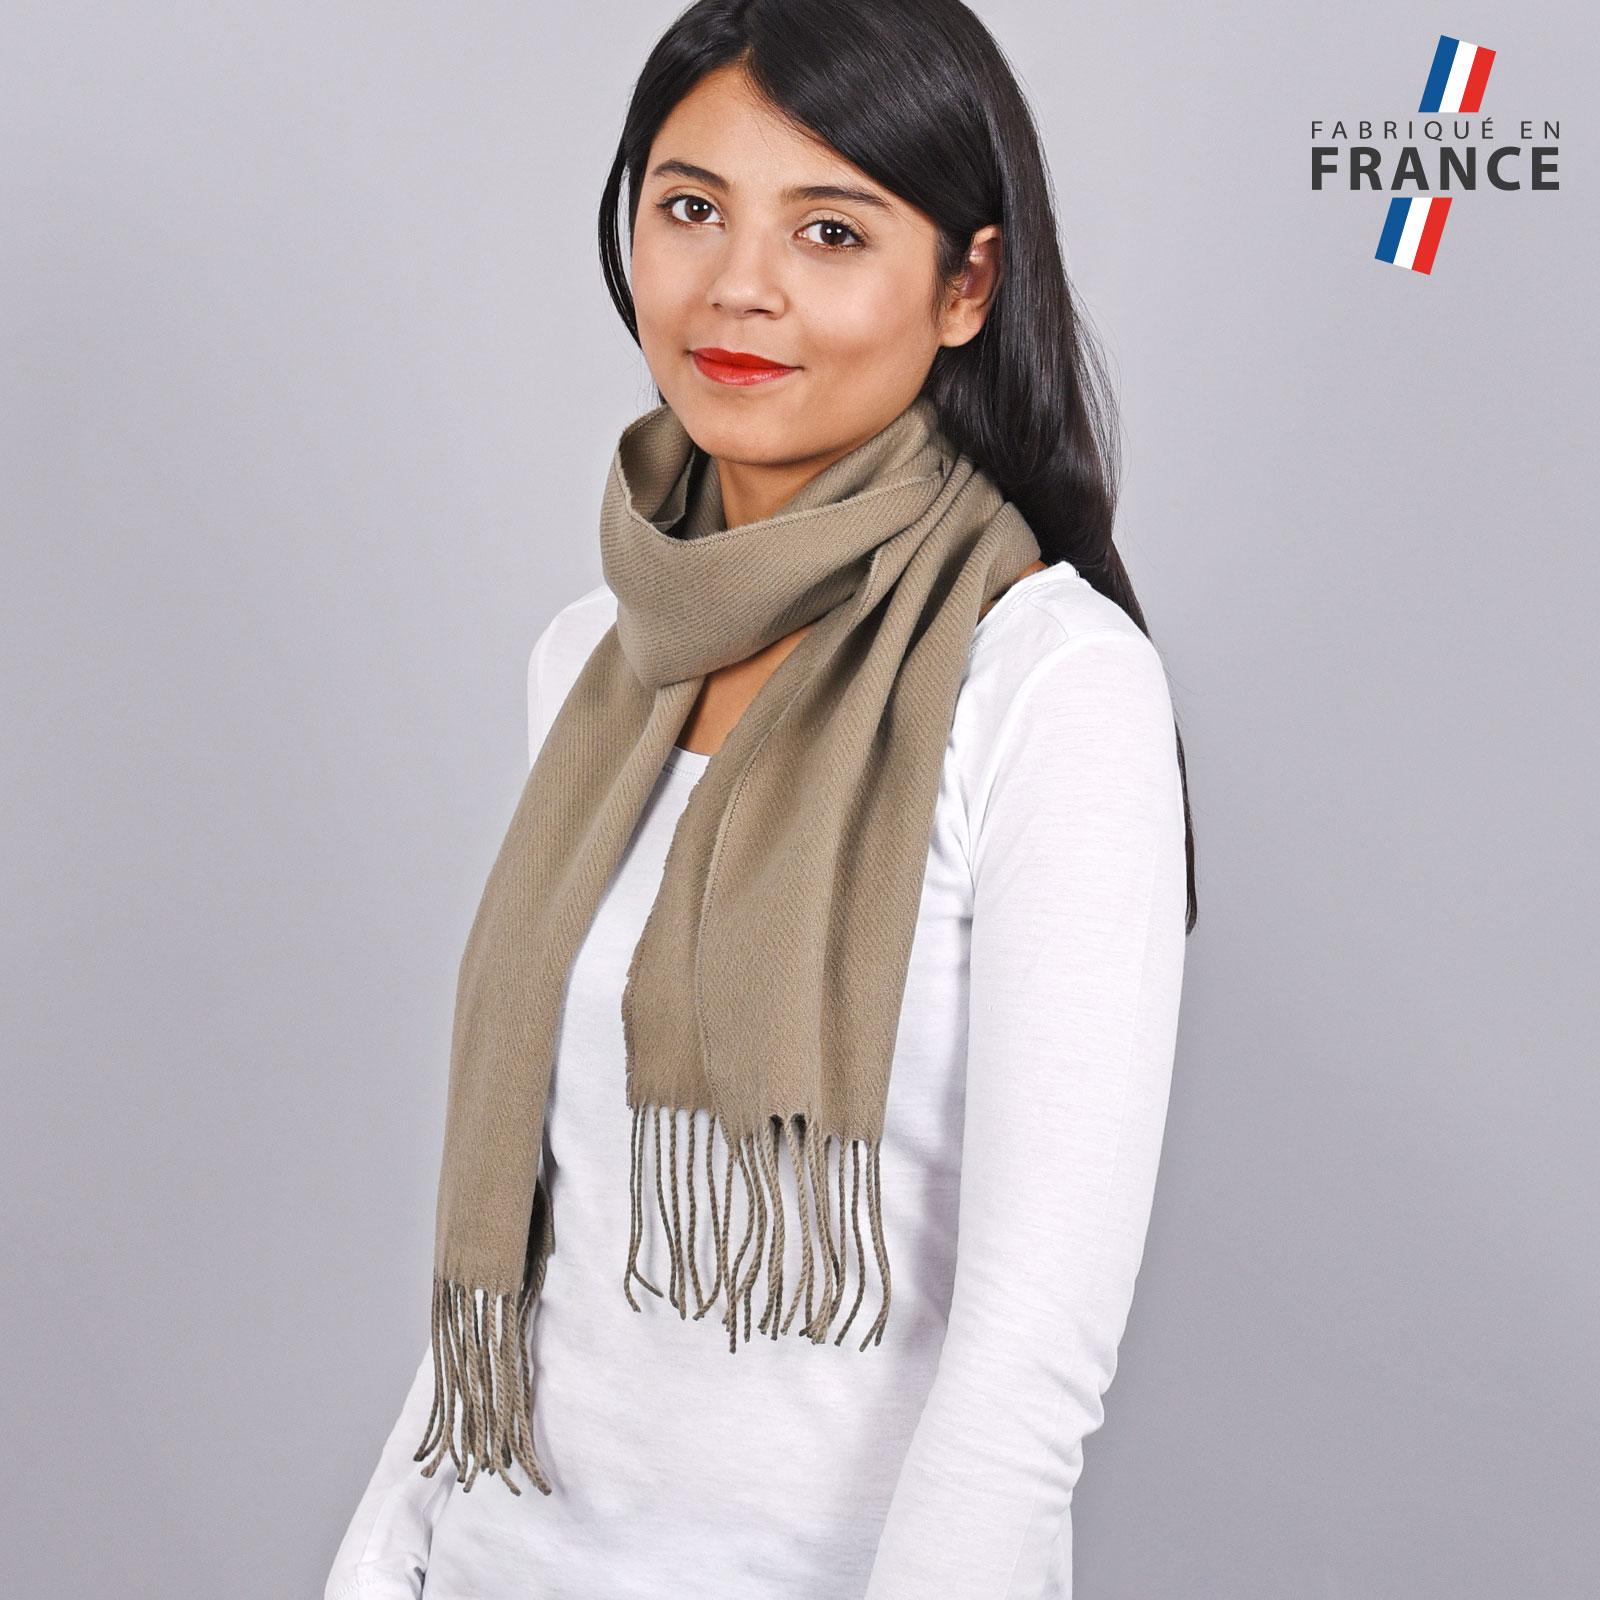 AT-03246-VF16-LB_FR-echarpe-franges-taupe-femme-fabrication-francaise